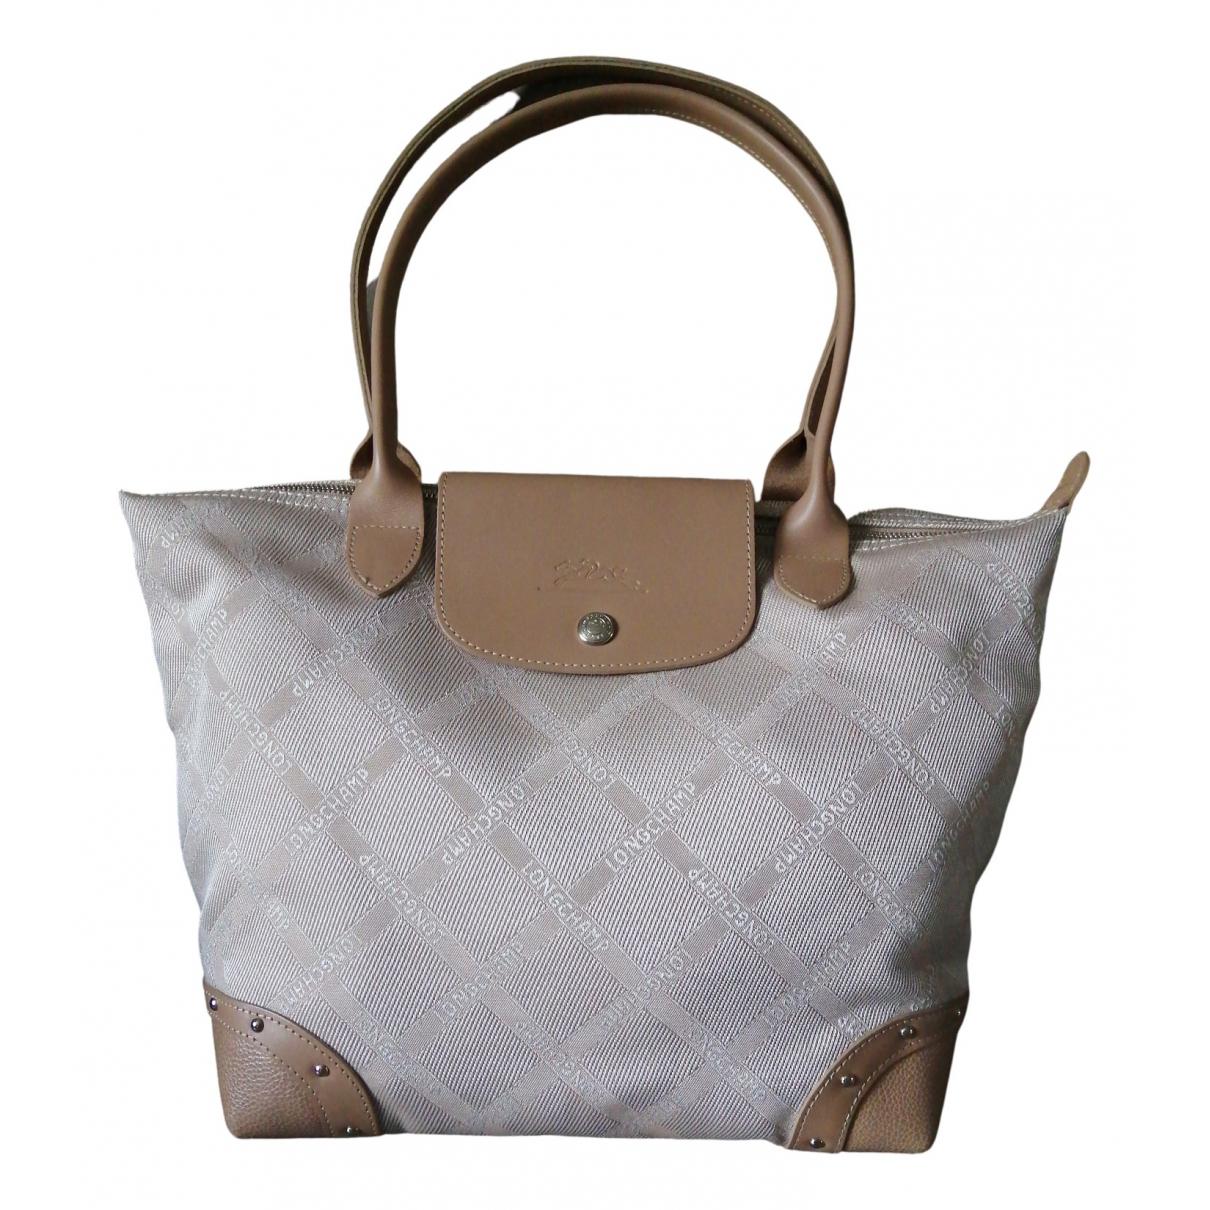 Longchamp - Sac a main   pour femme en toile - ecru